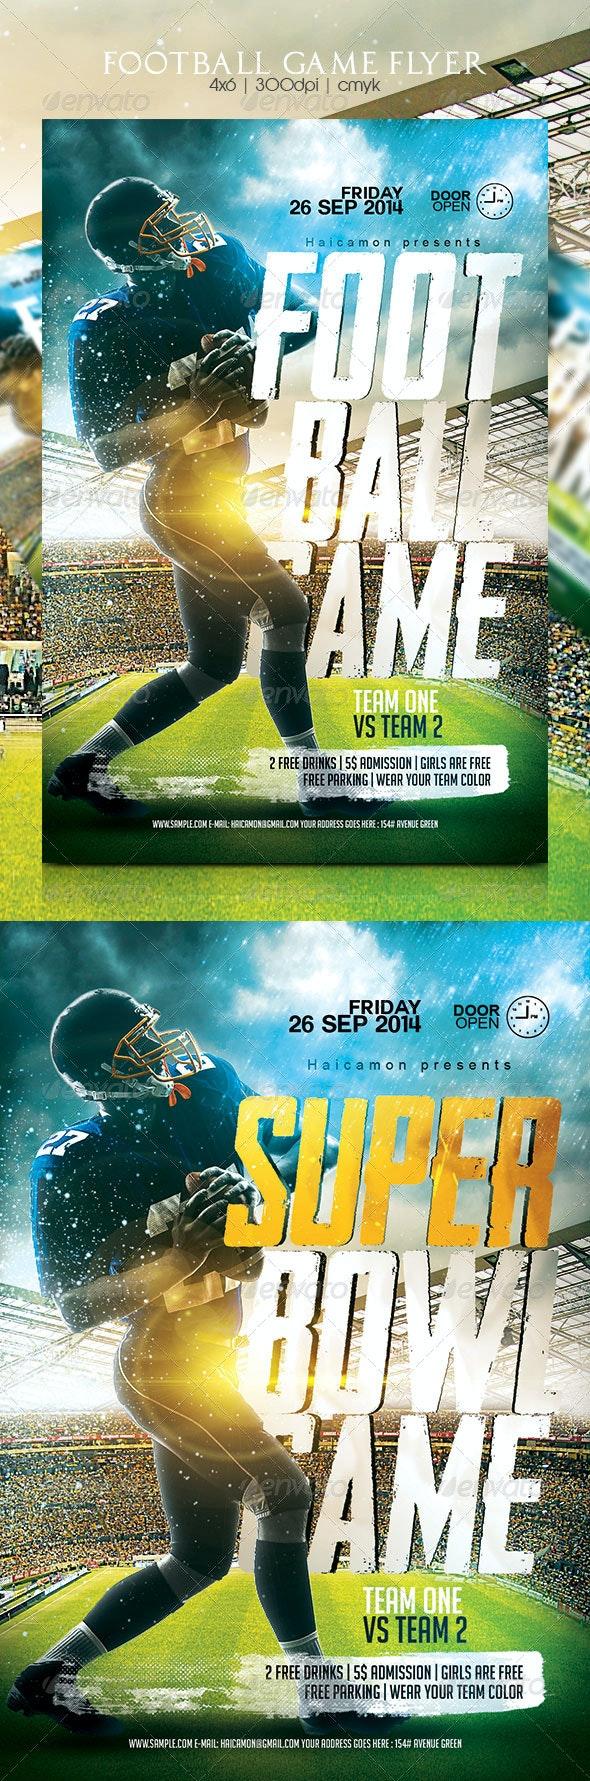 Football Game Flyer - Flyers Print Templates